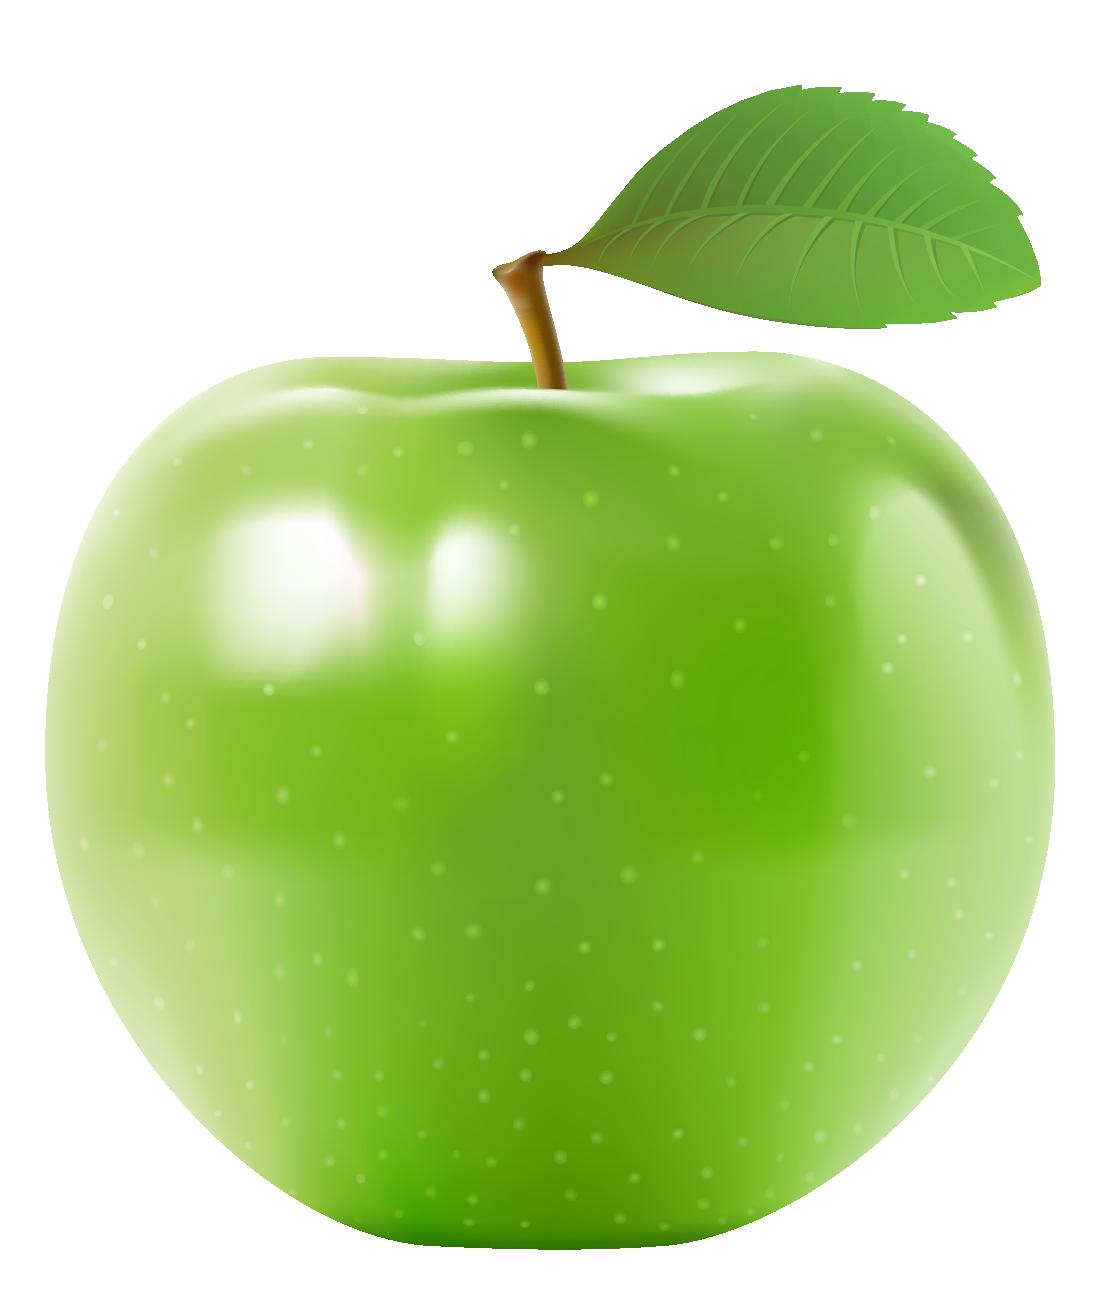 Green Apple S Png Image Apple Fruit Images Apple Fruits Images